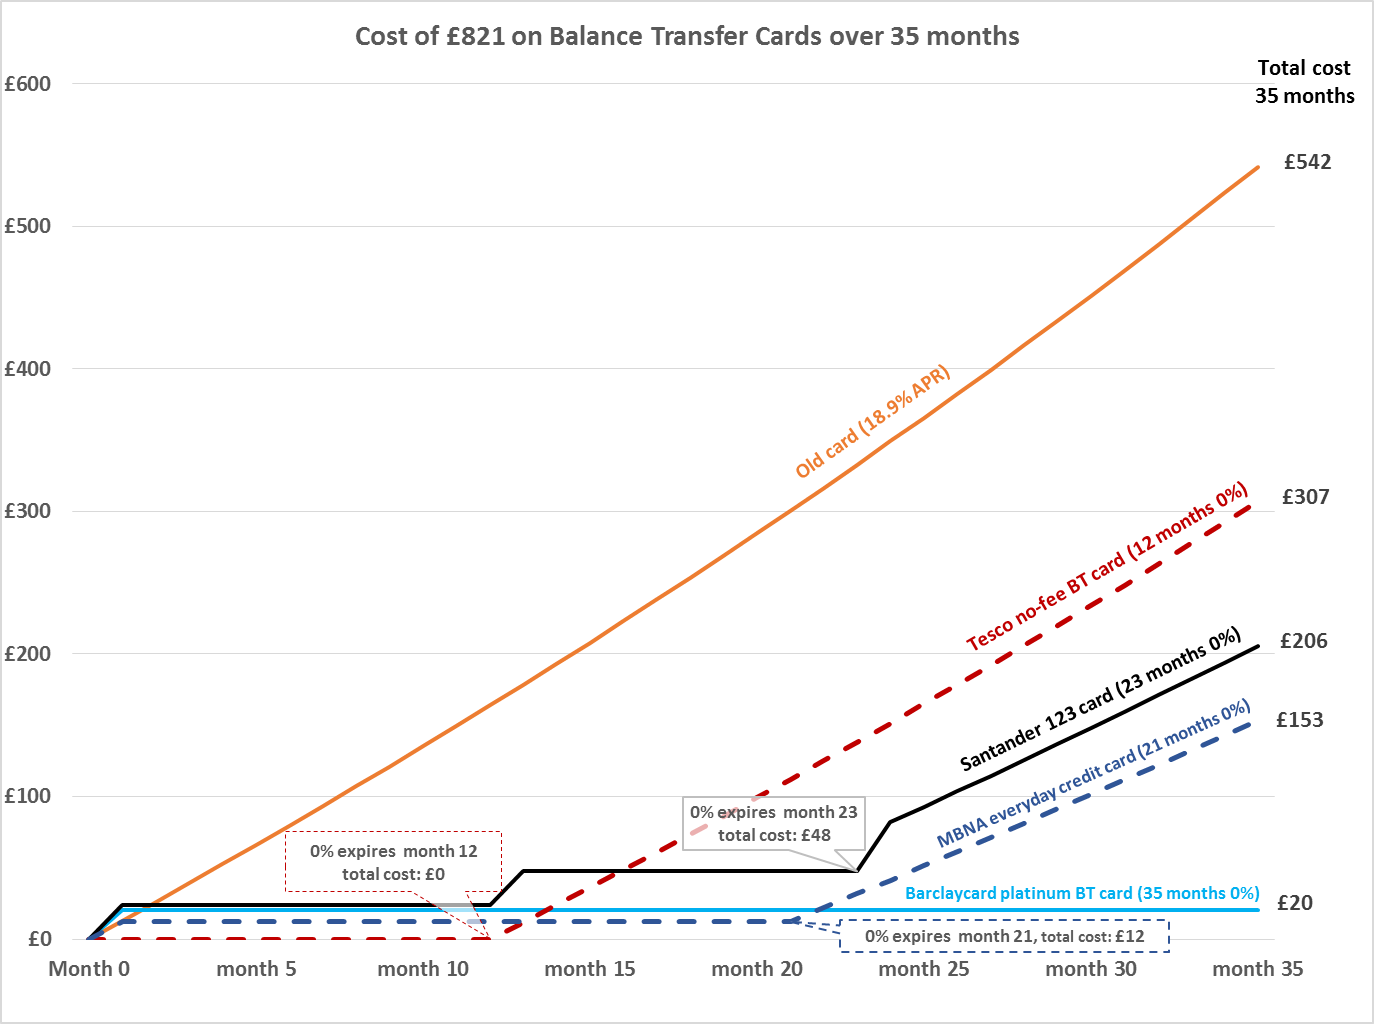 BT cost